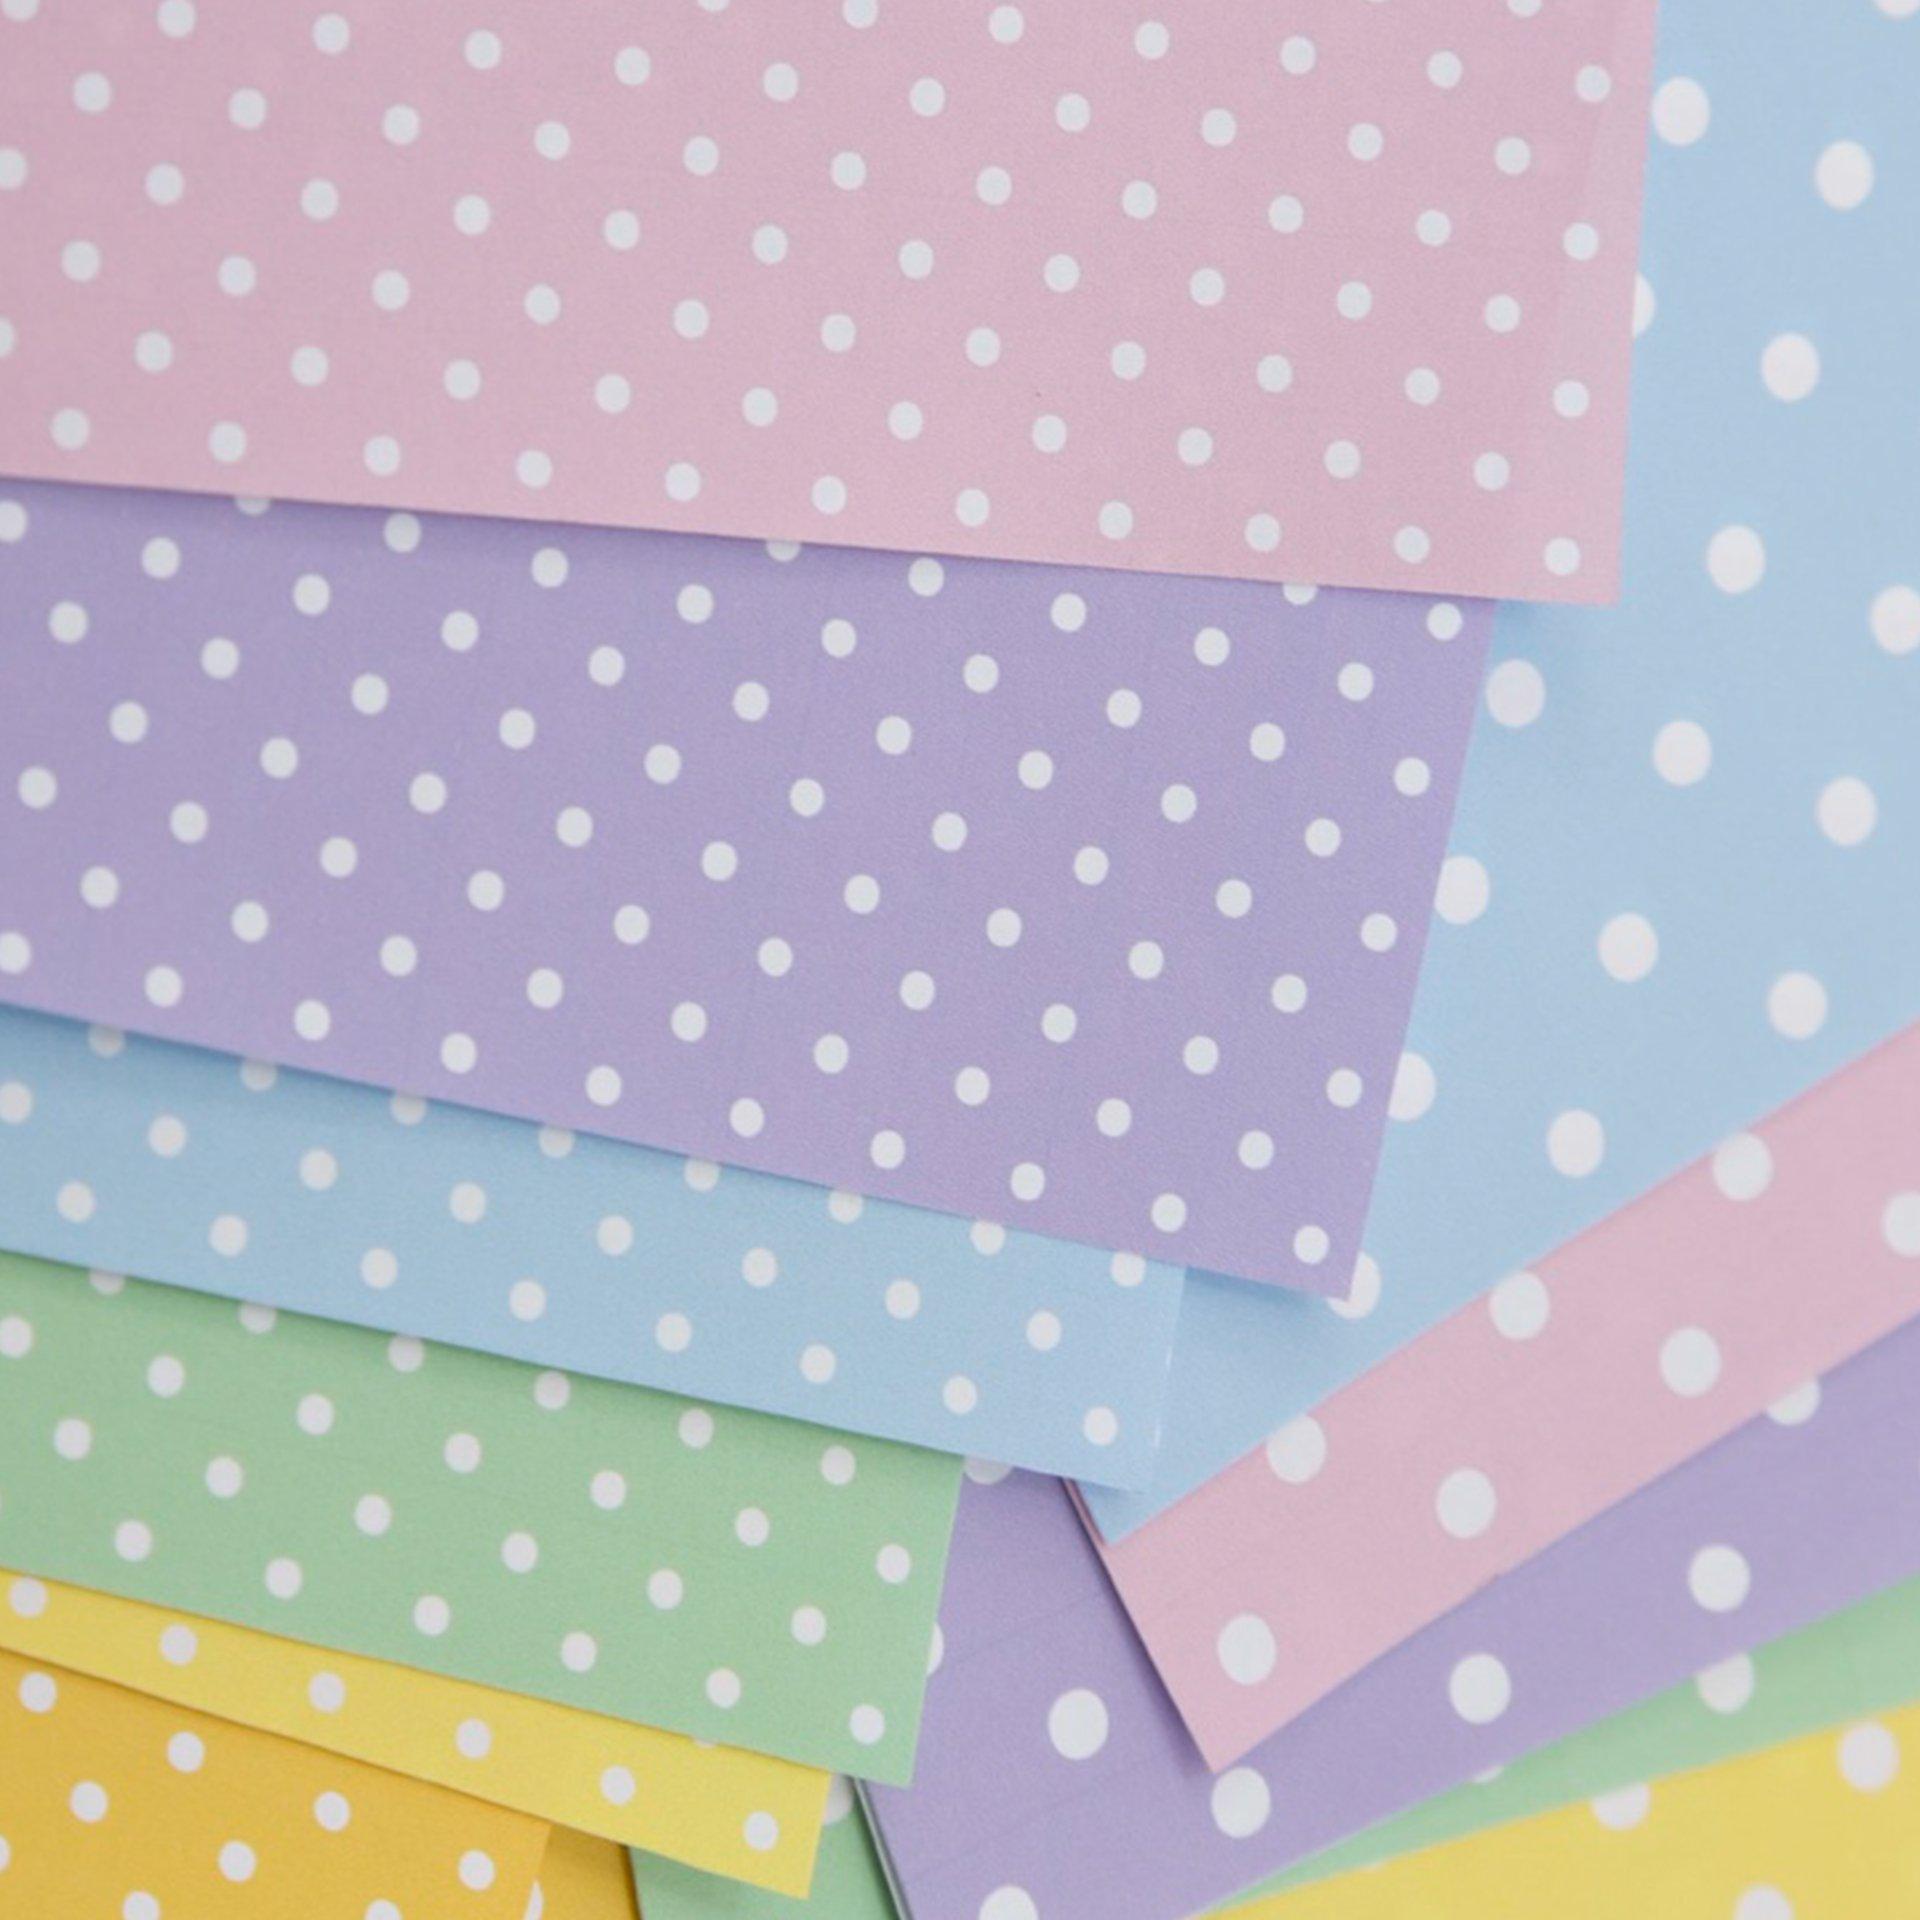 Polka Dot Pattern Printable Origami Paper - Paper Kawaii Shop - photo#37